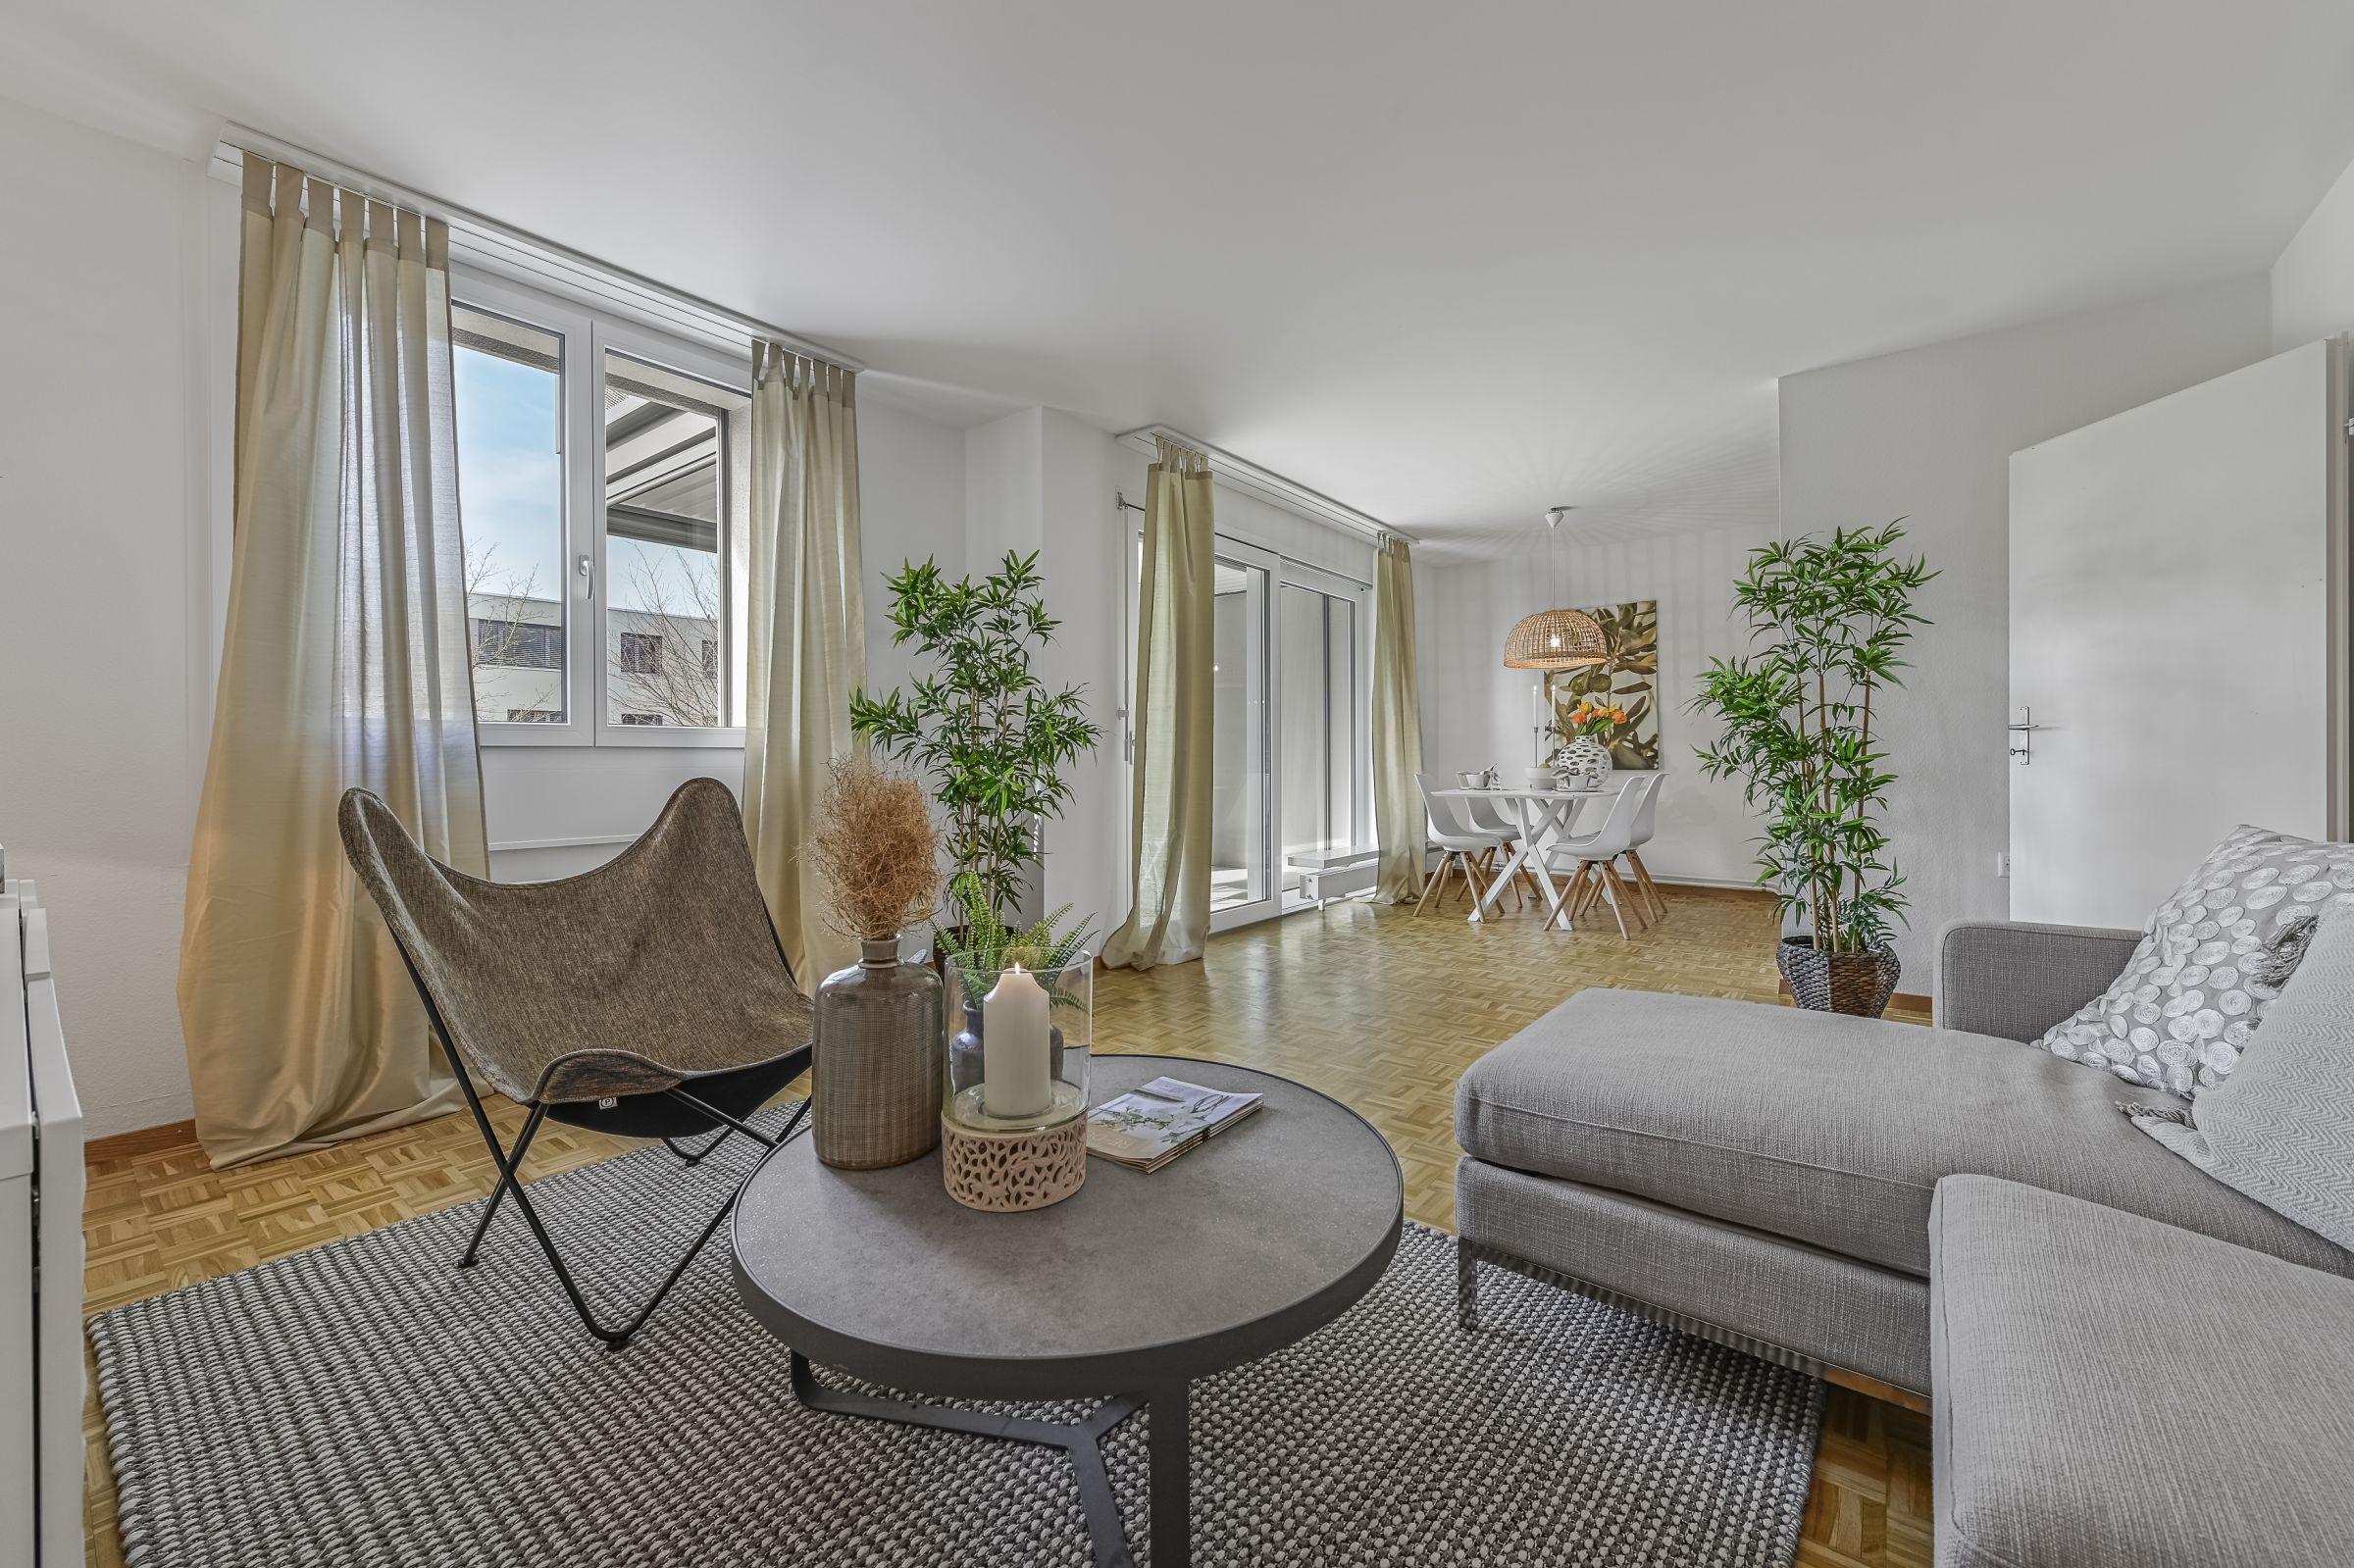 Semi-detached house for rent - Ltzelbachweg 15, 4123